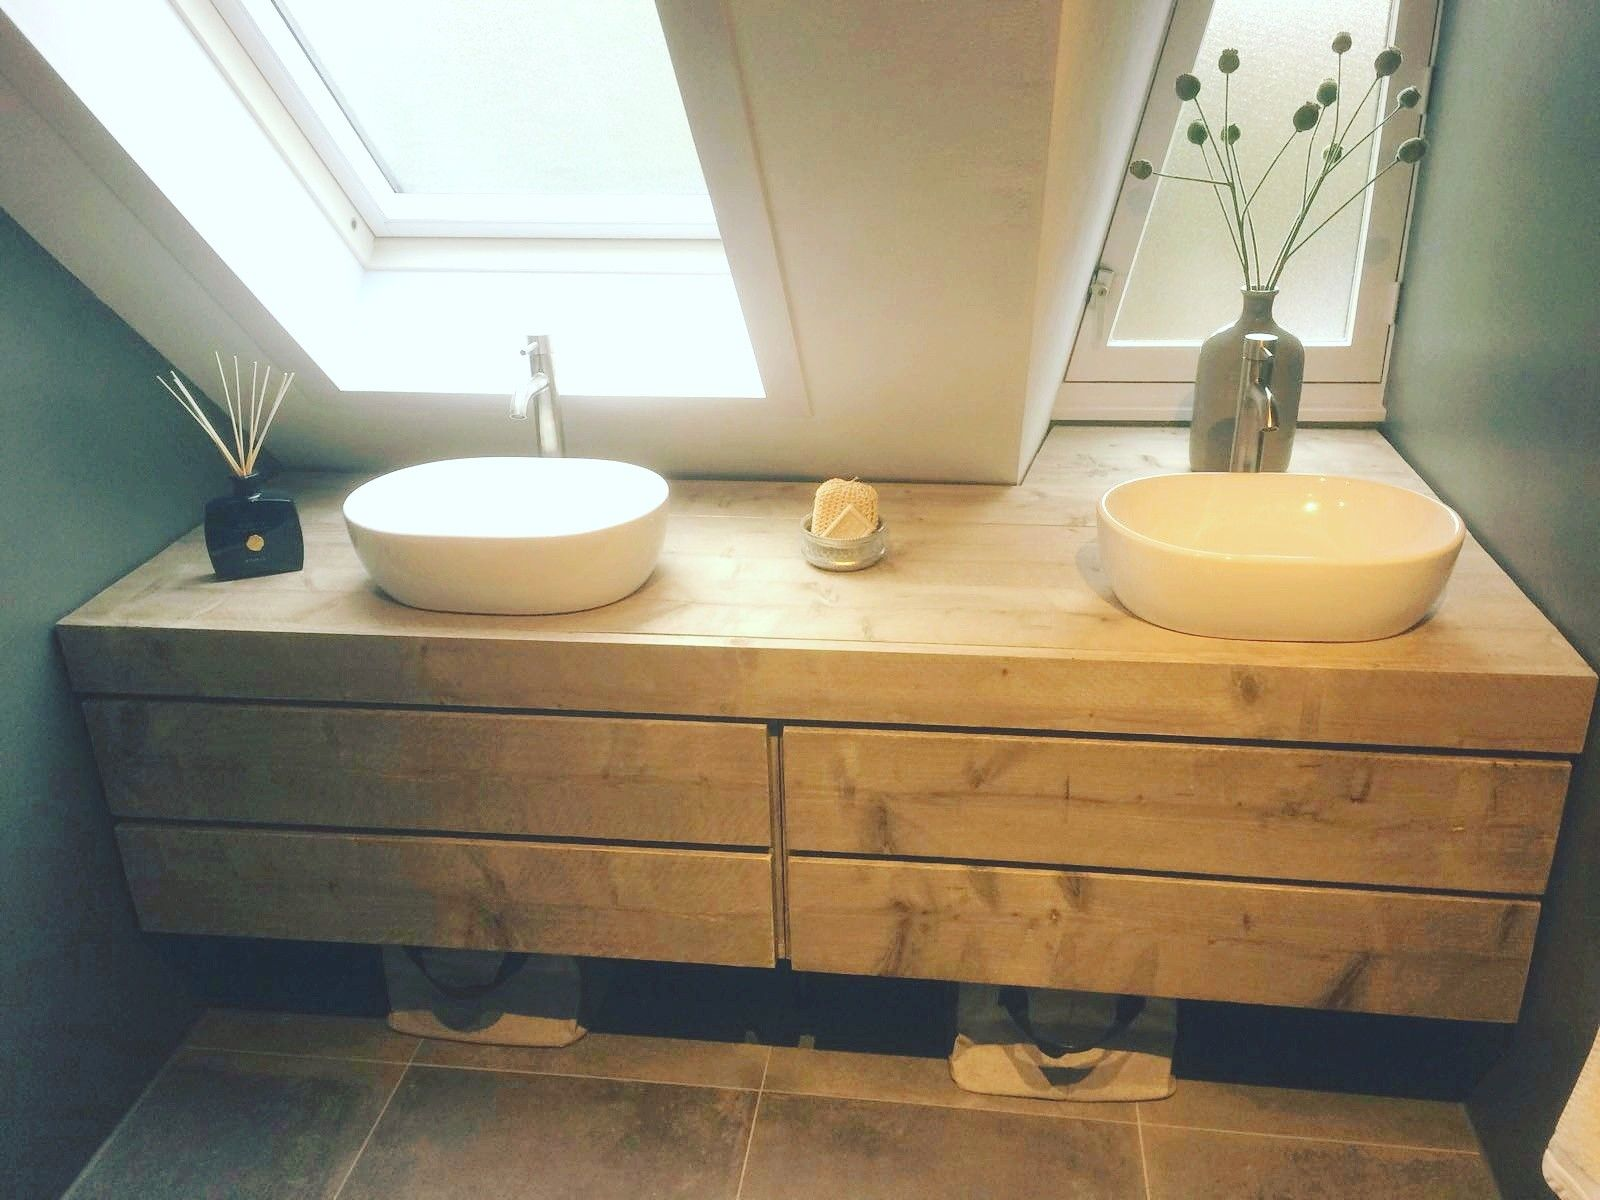 Badkamer Met Steigerhout : Nice steigerhout badkamer meubel fotos van badkamer stijl